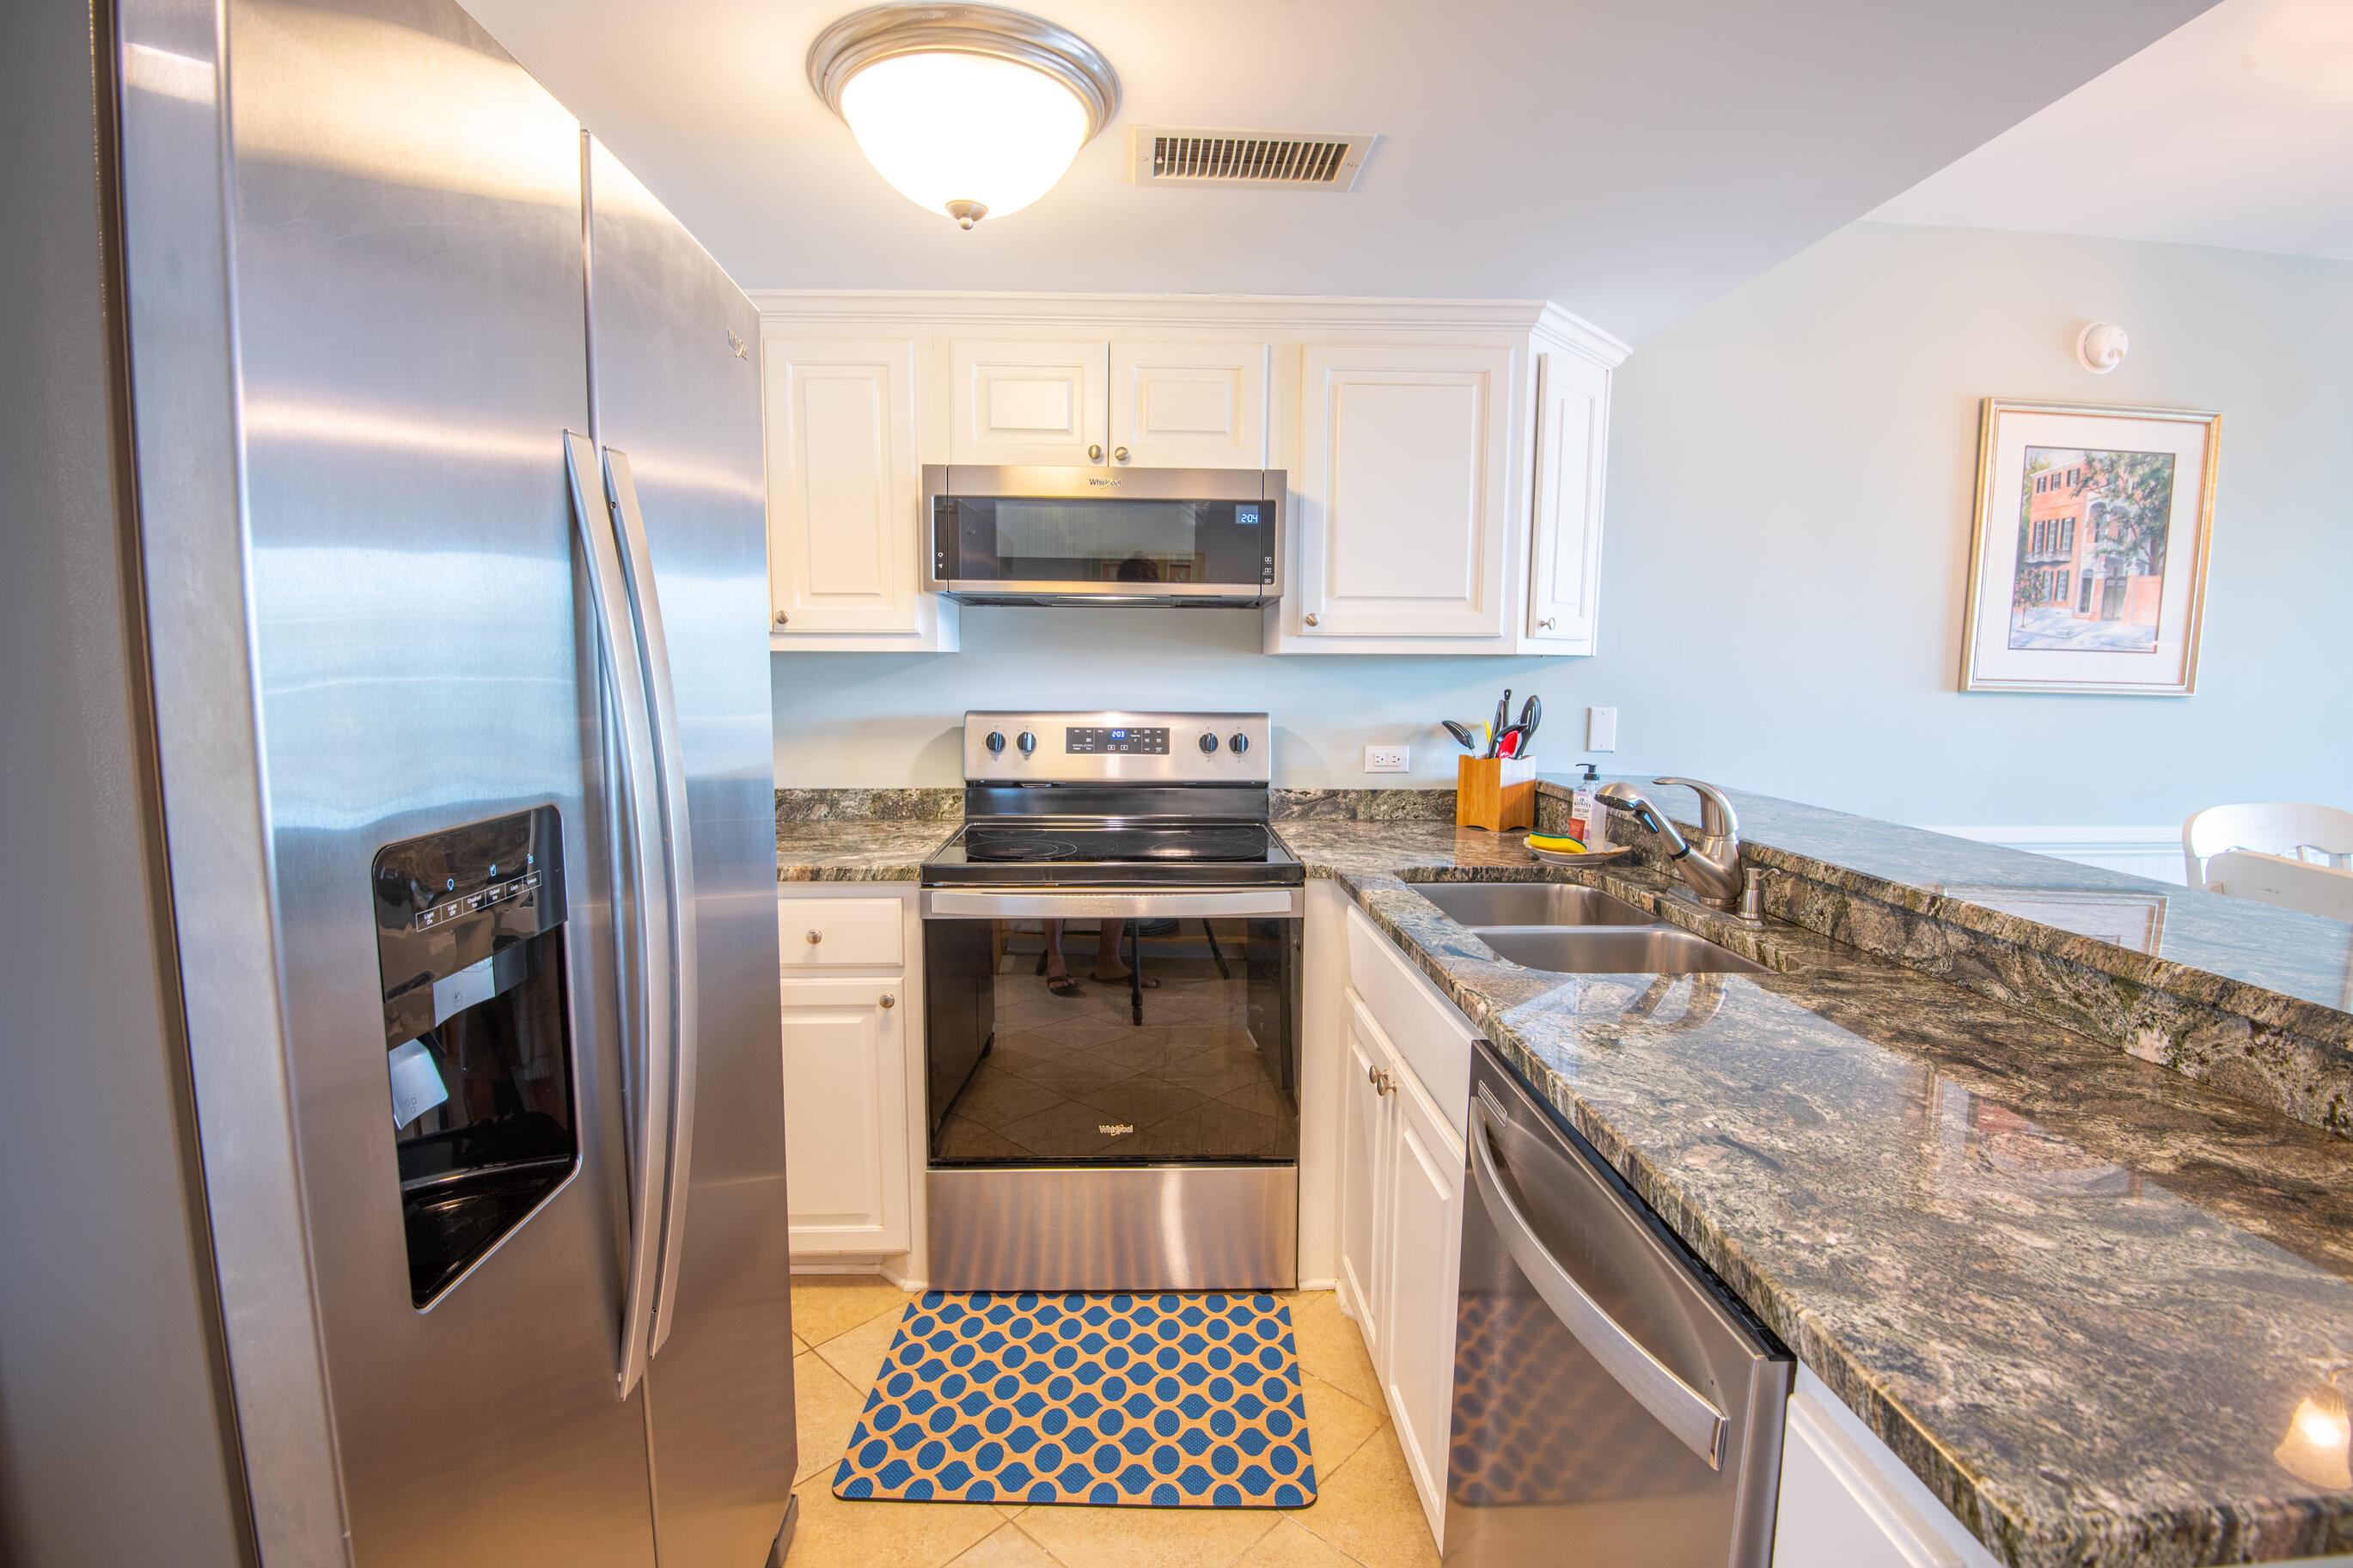 Atrium Villas Homes For Sale - 2935 Atrium Villa, Seabrook Island, SC - 34